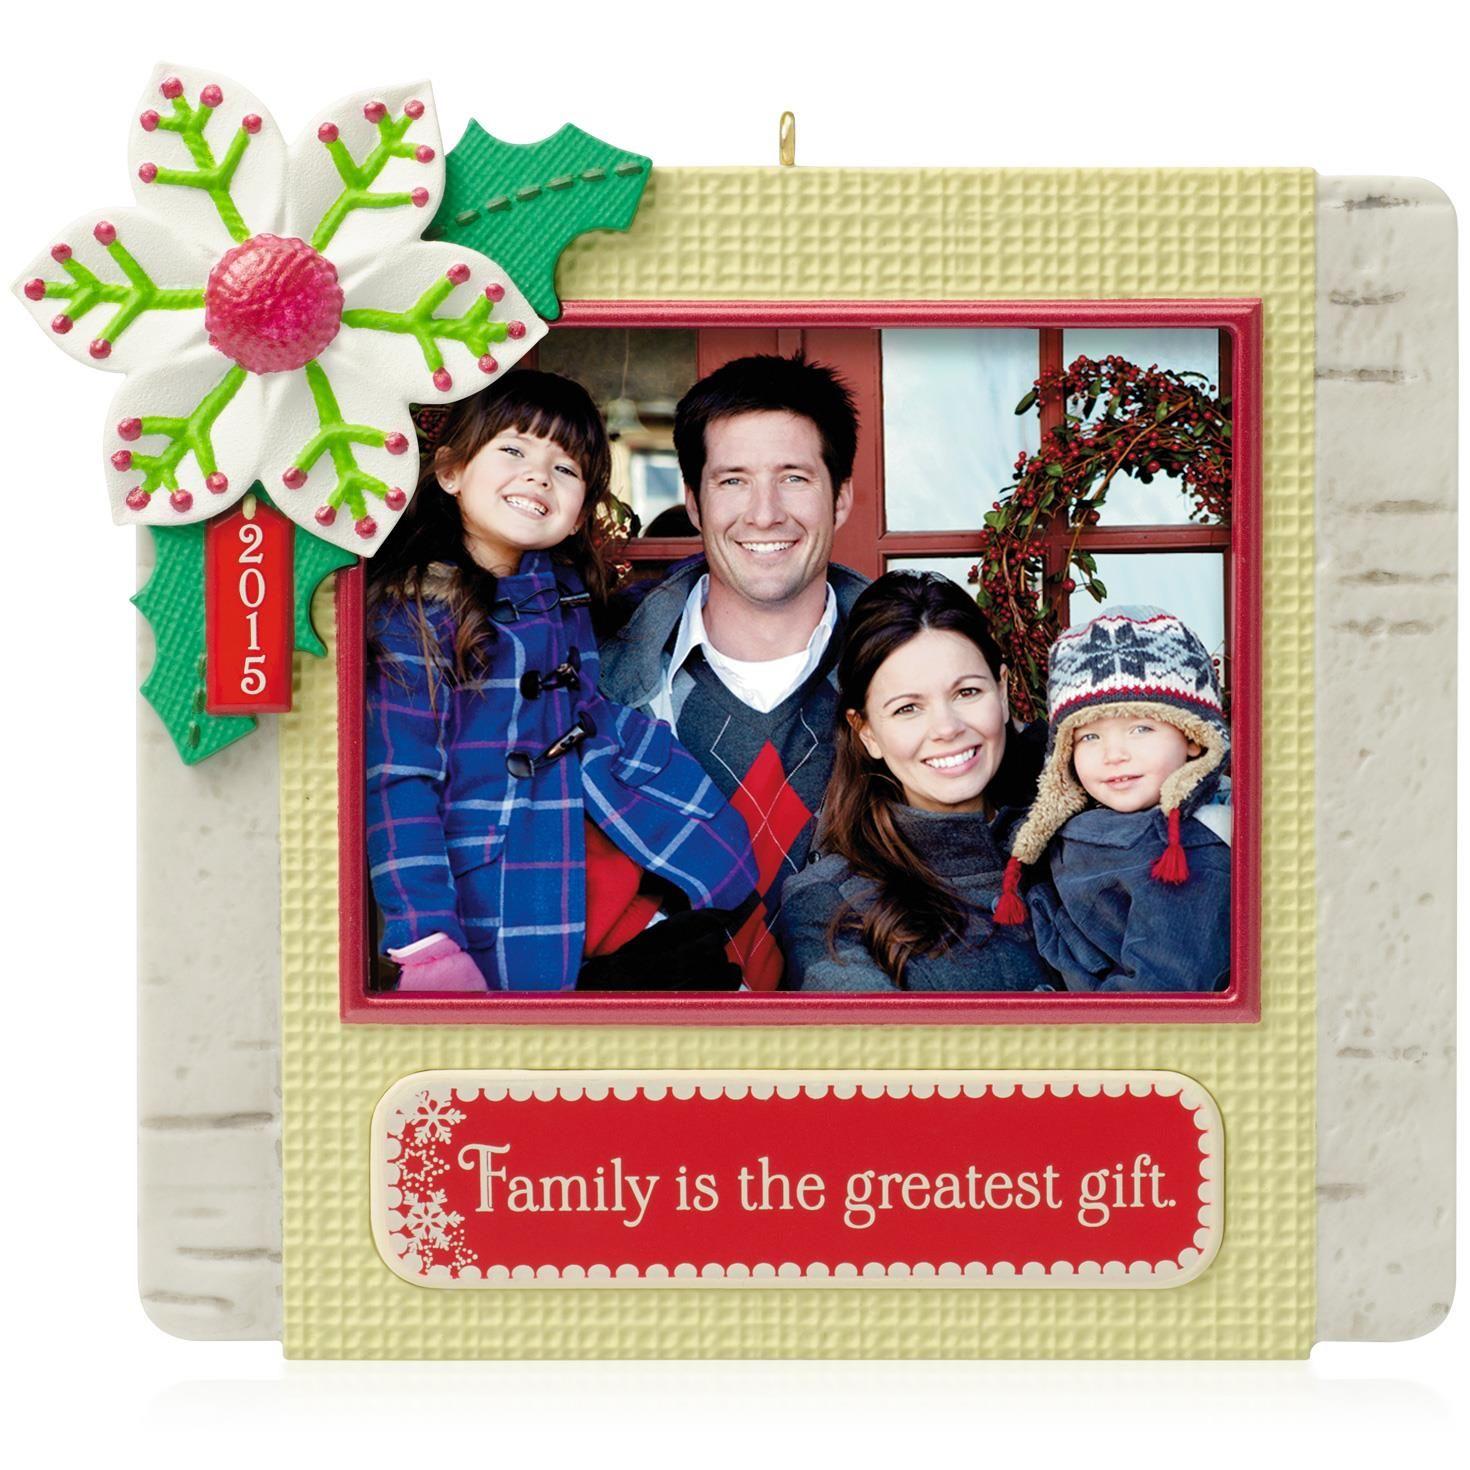 2015 Our Family Photo Holder Hallmark Keepsake Ornament